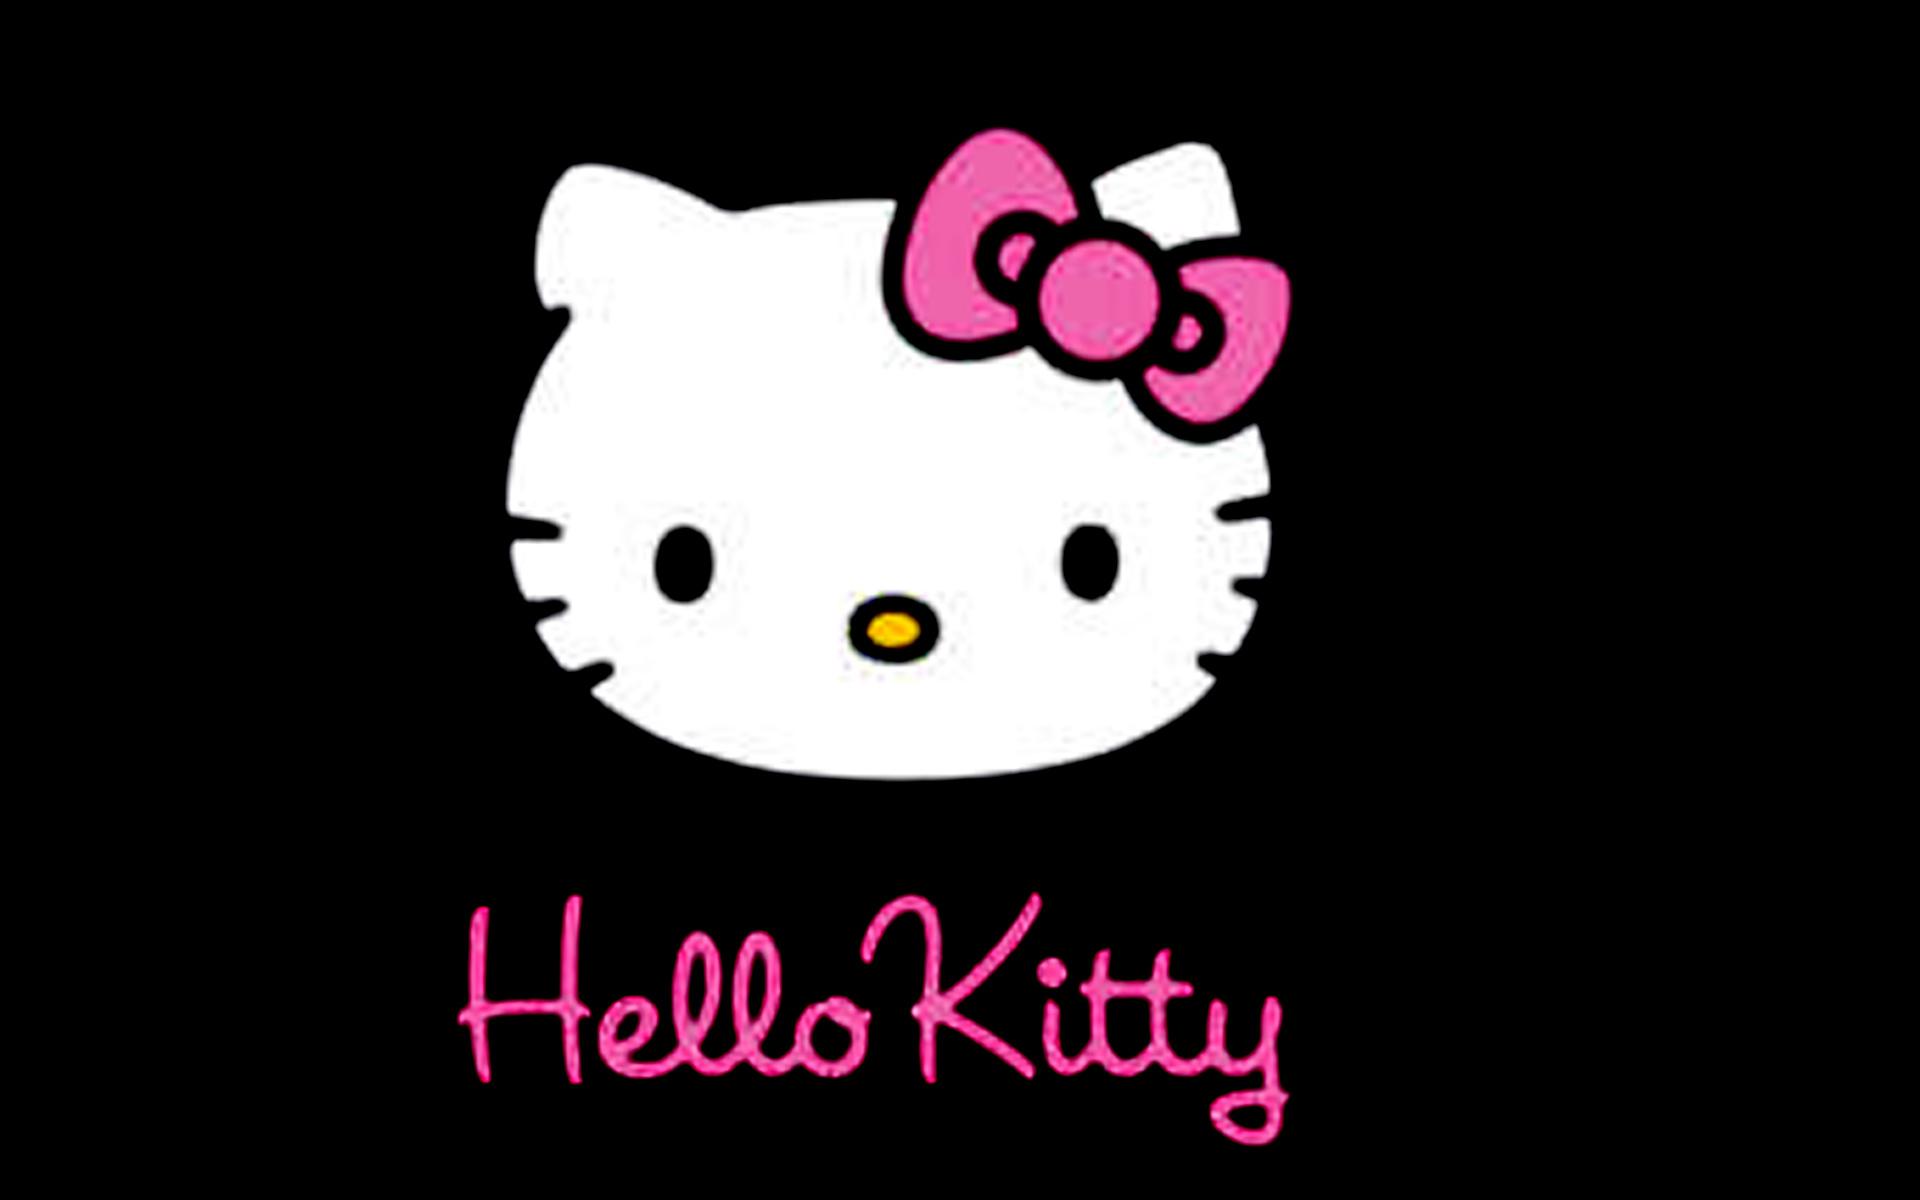 Hello Kitty Black Backgrounds wallpaper Hello Kitty Black 1920x1200